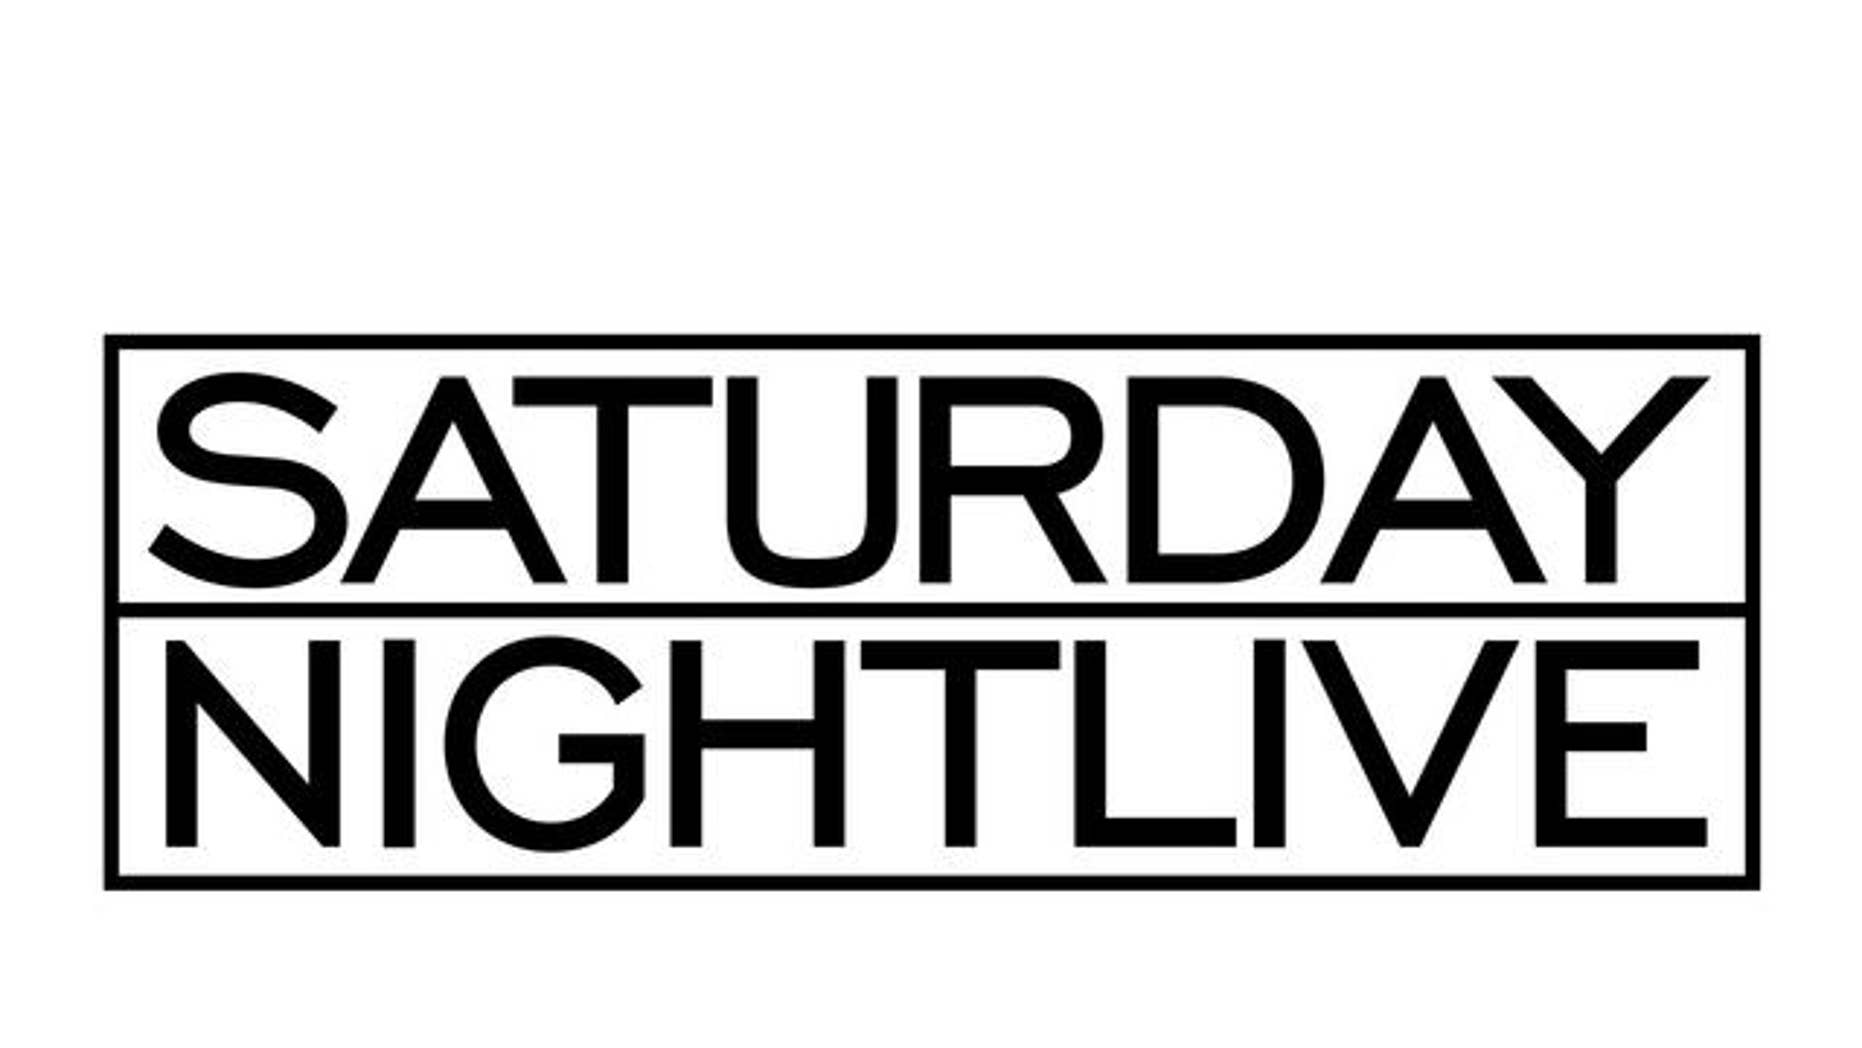 'Saturday Night Live' logo